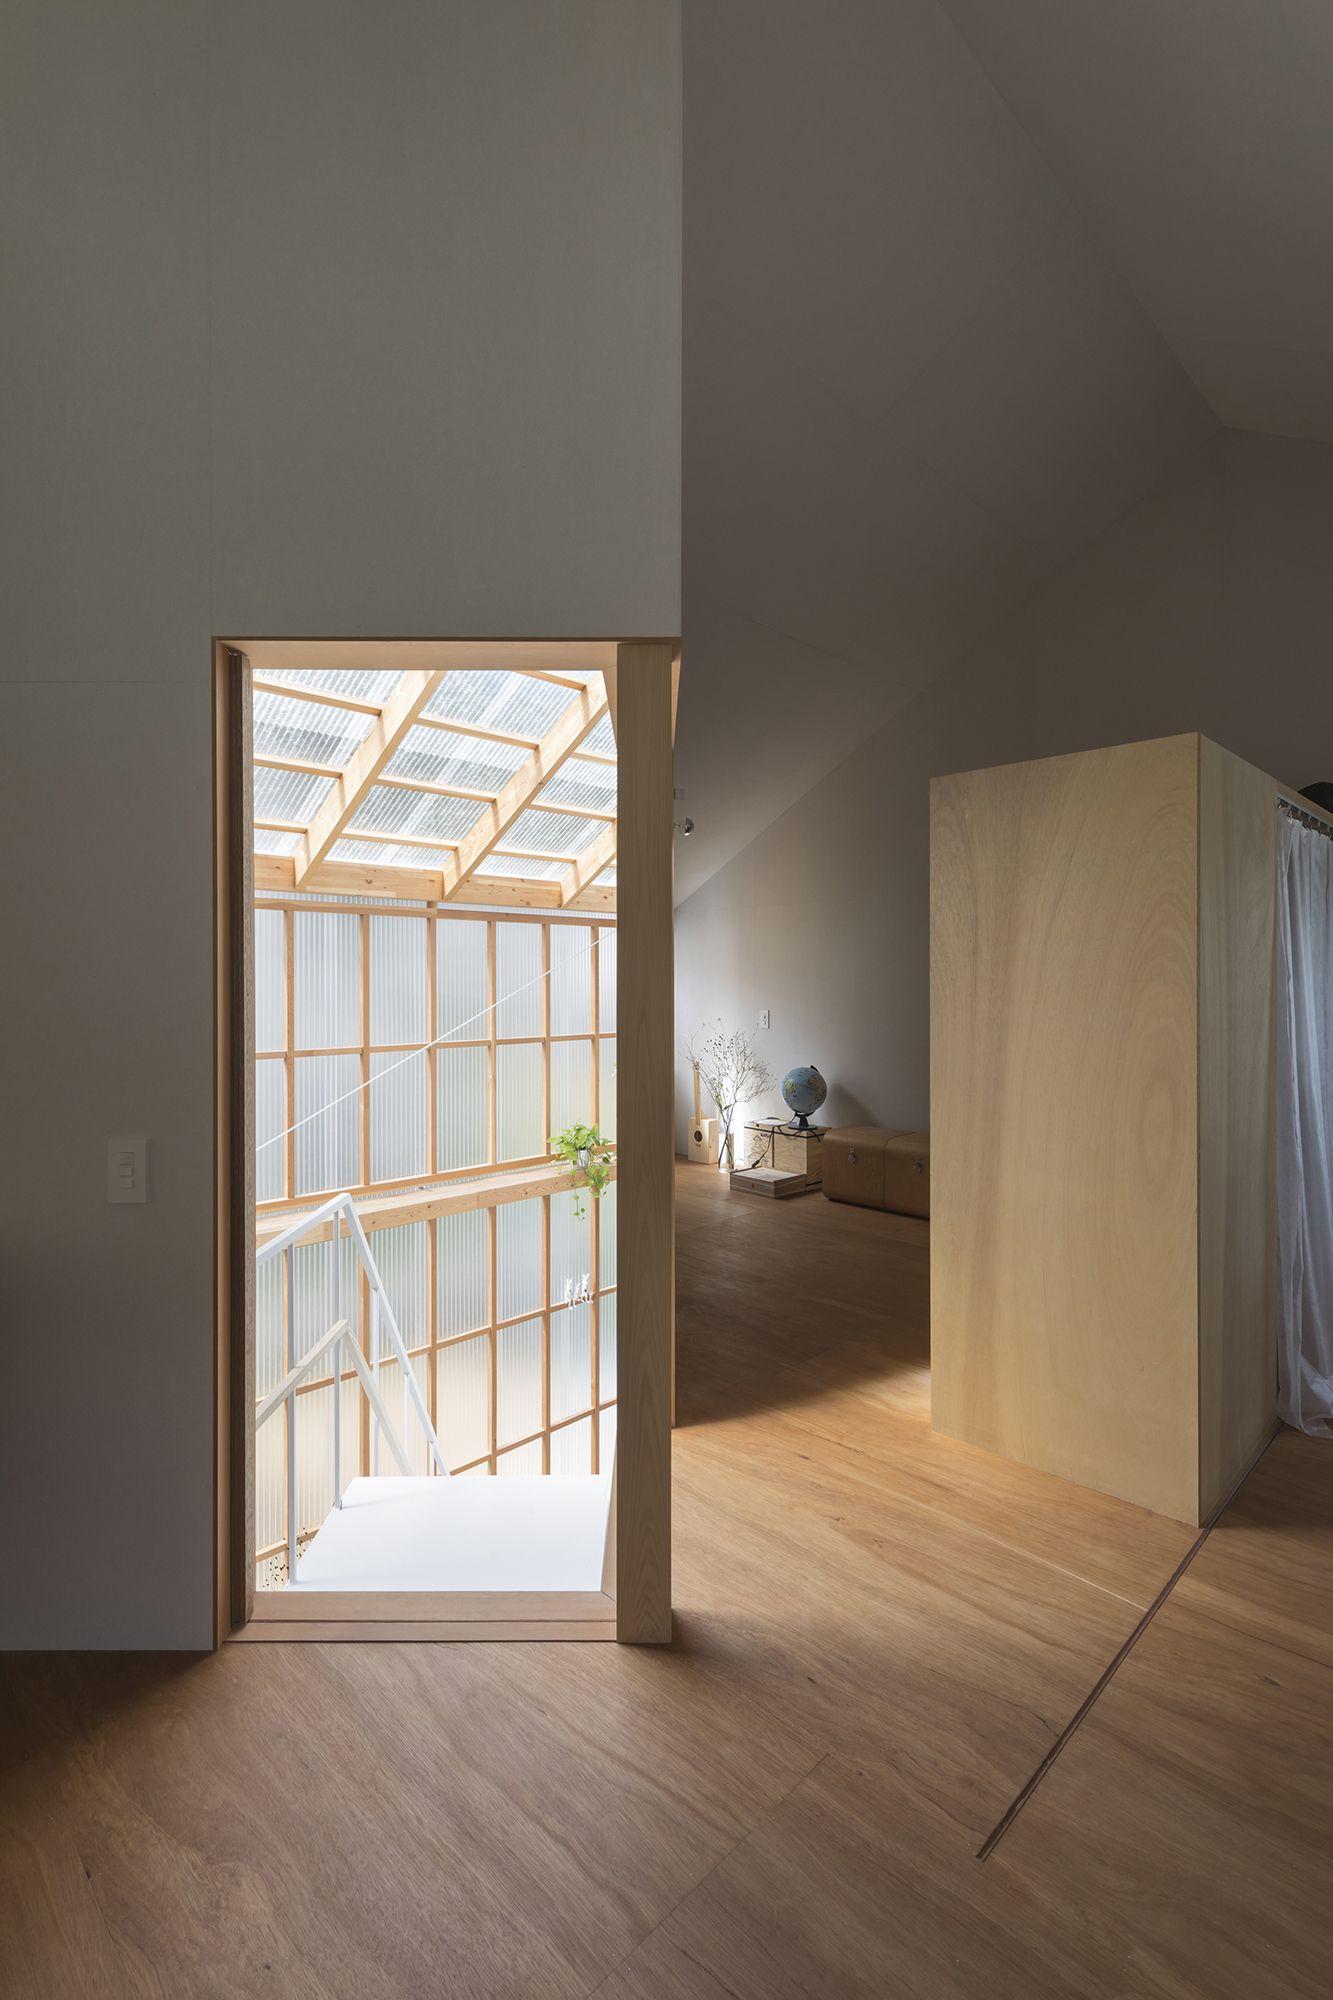 House In Sonobe 画像あり 建築家 家のデザイン 建築設計事務所